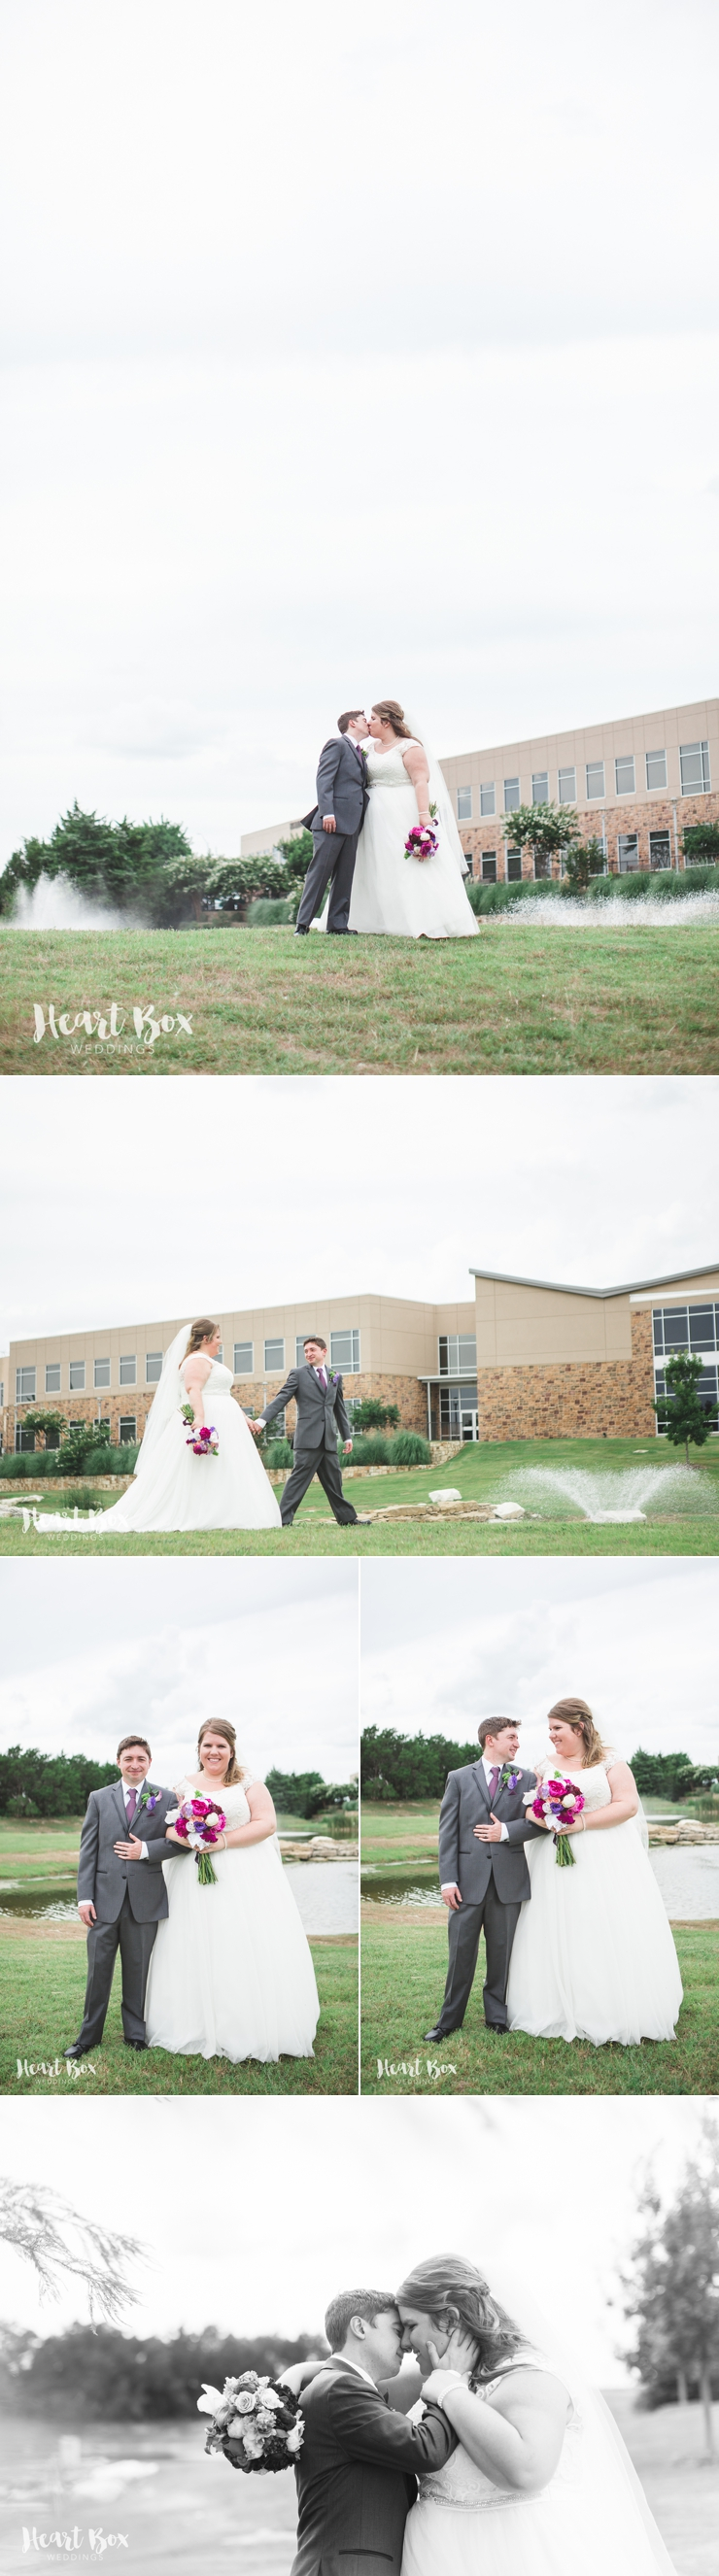 Ryan Blog Collages 13.jpg